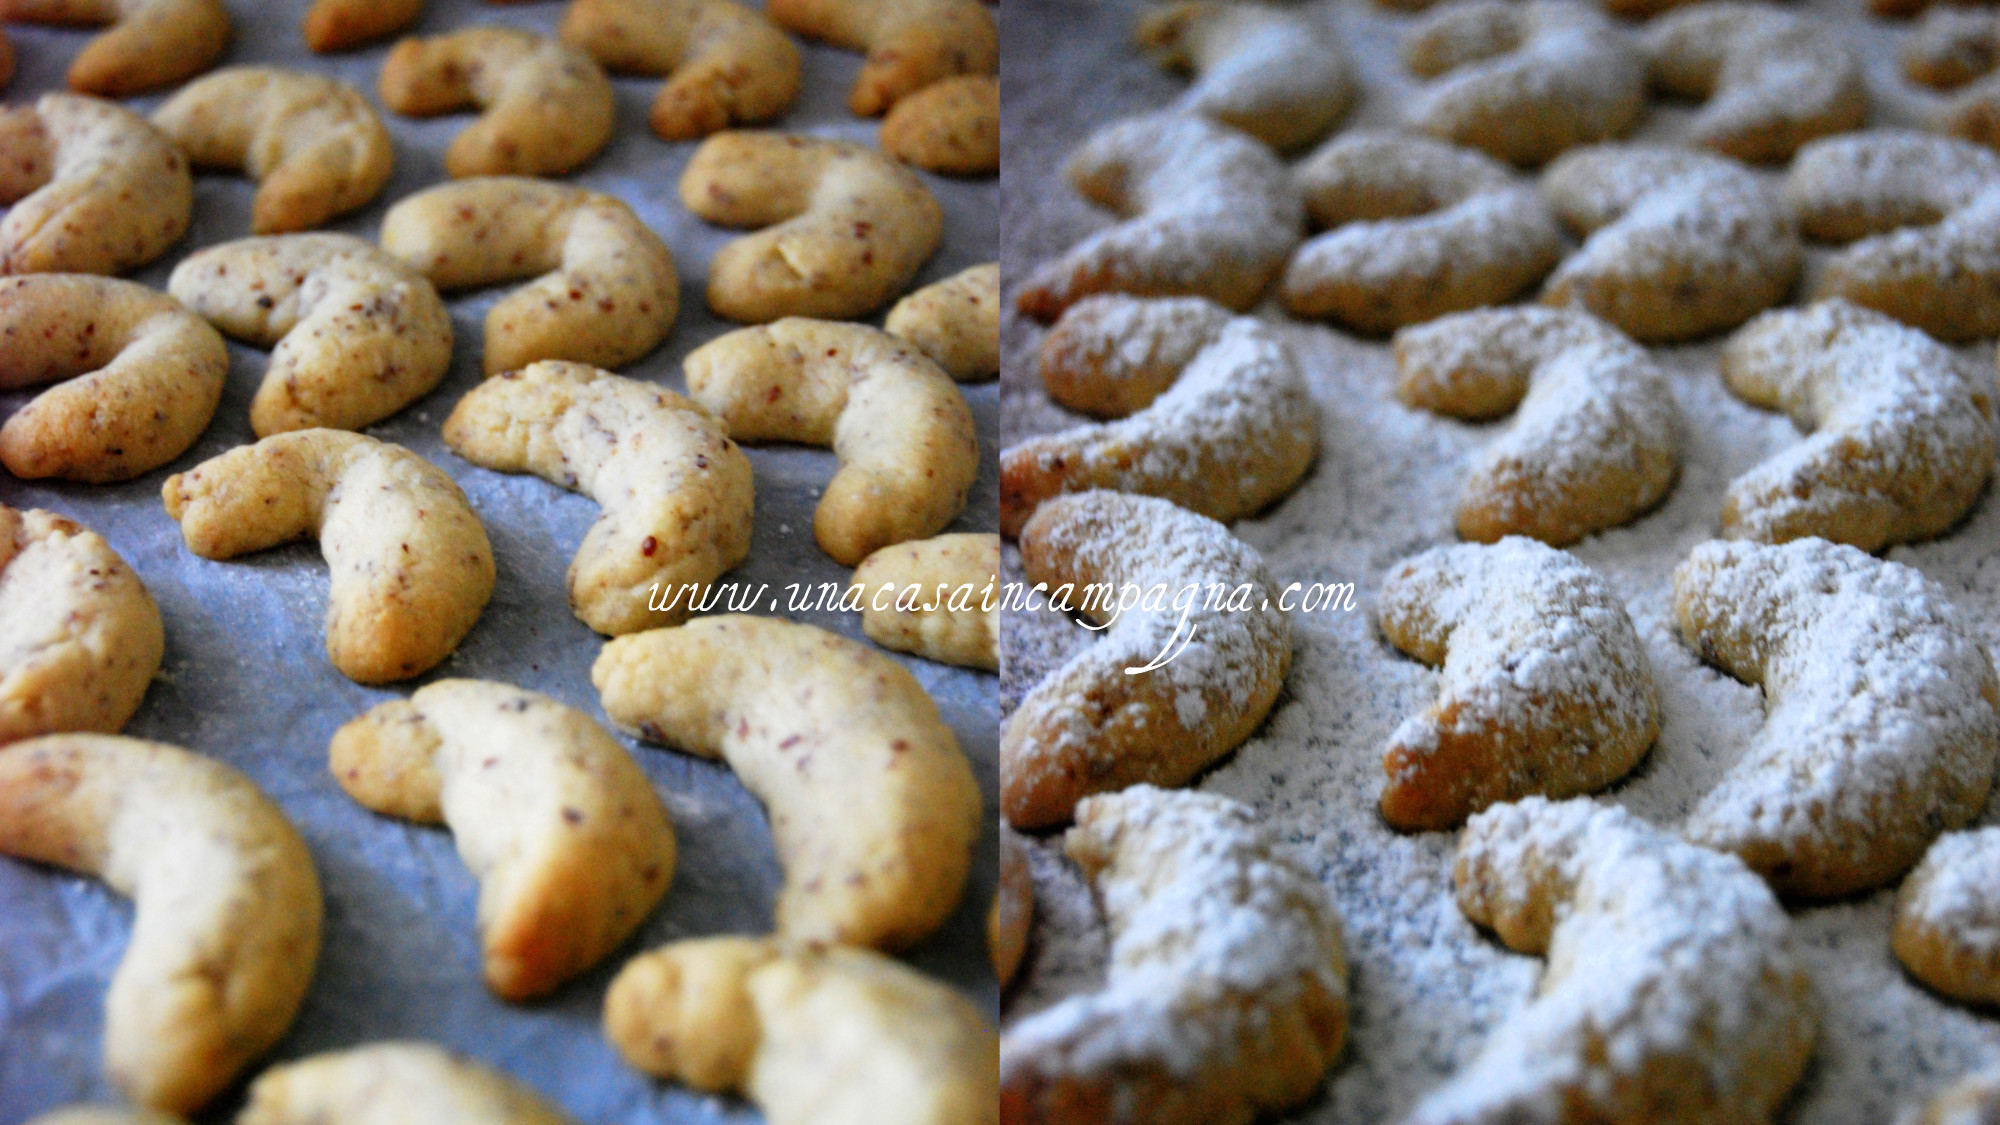 Biscotti di Natale-Vanillekipferln alle Nocciole